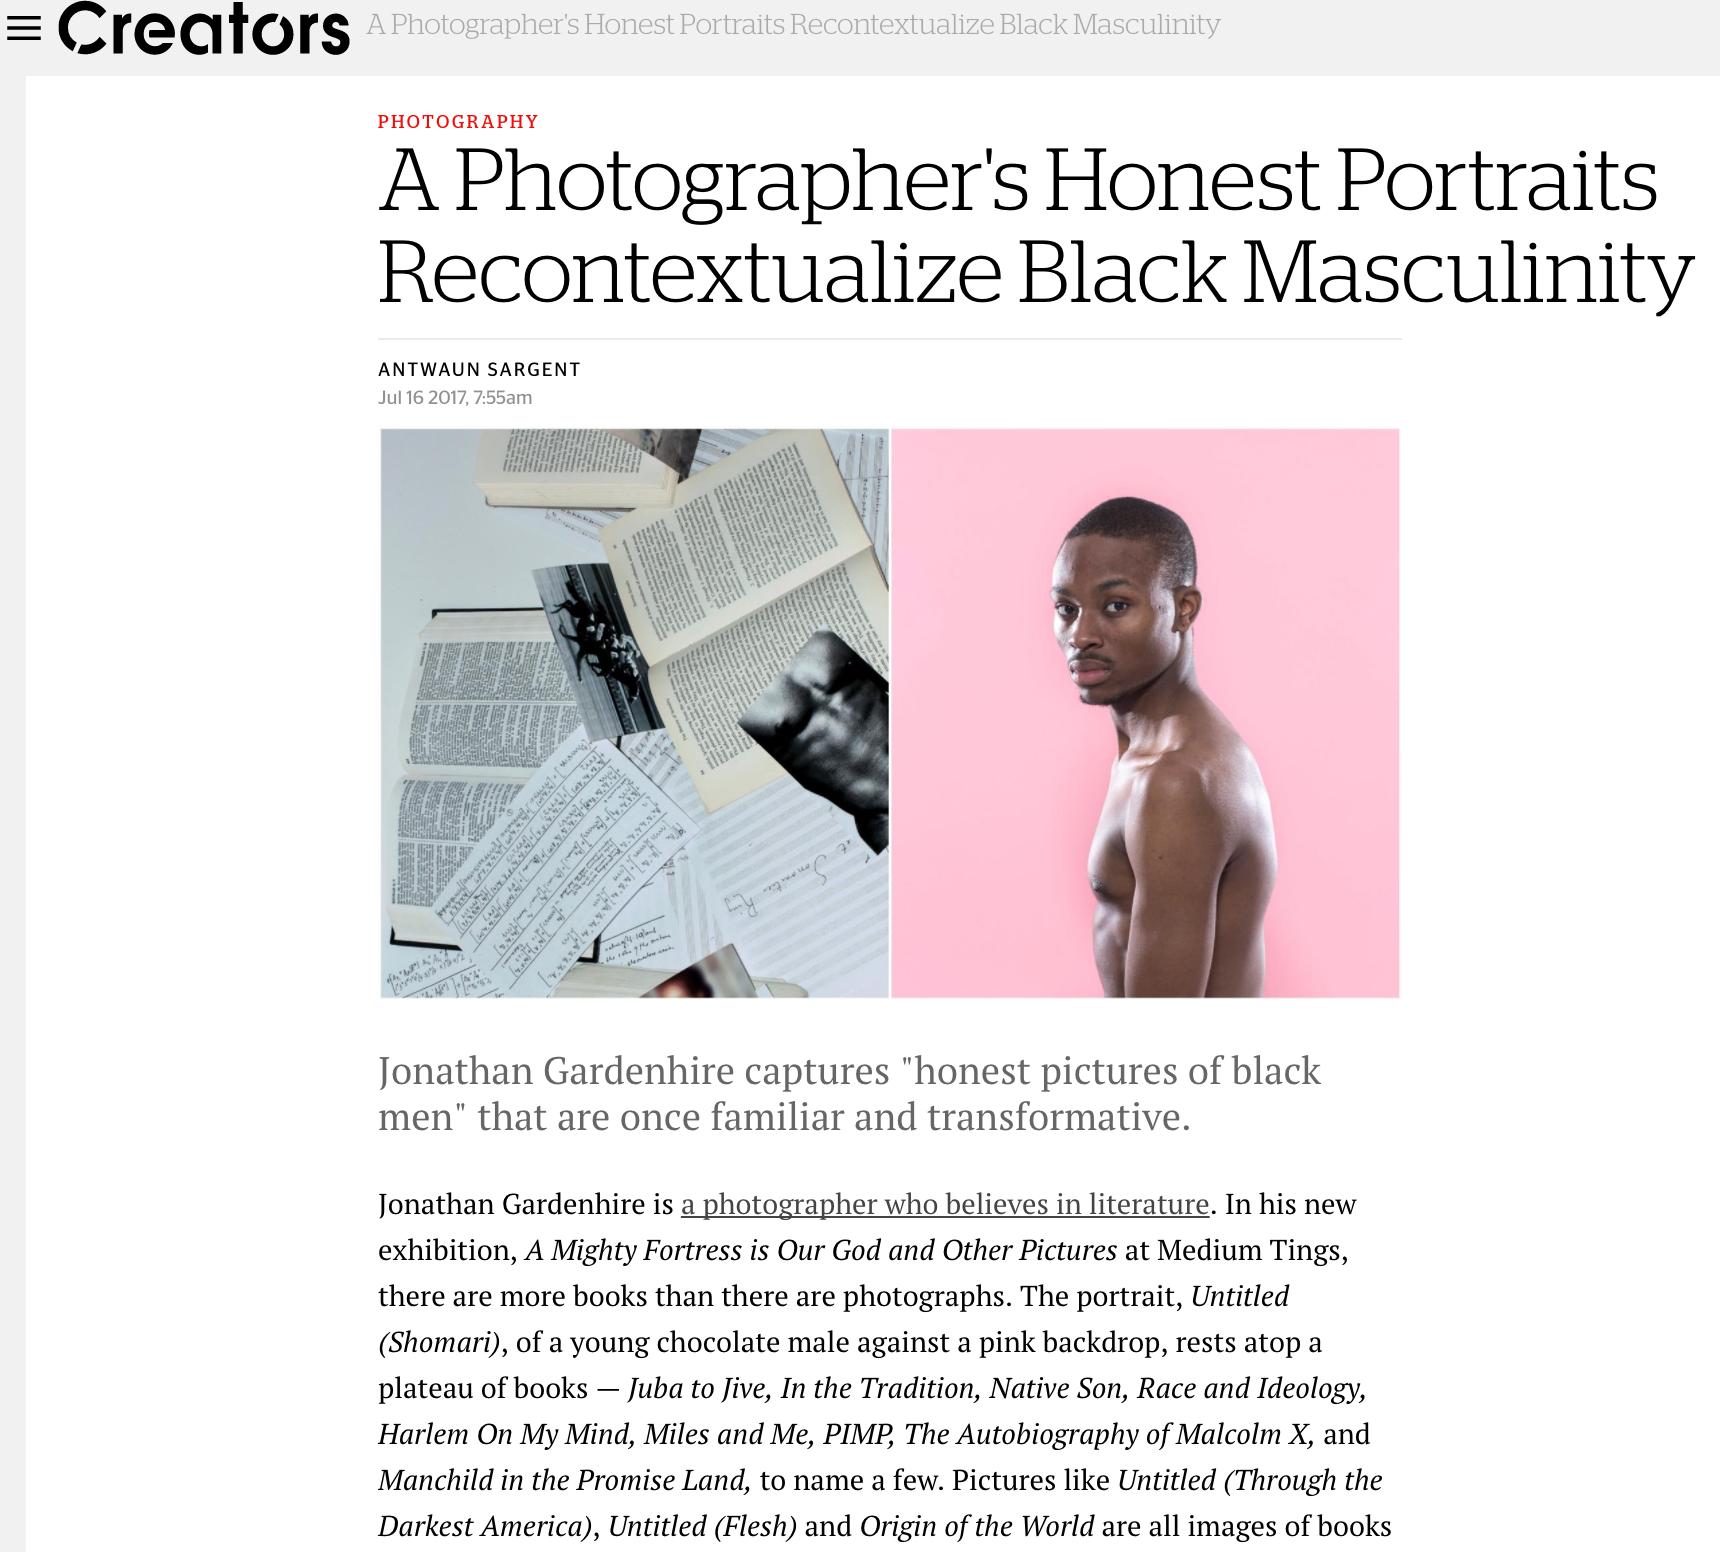 https://creators.vice.com/en_us/article/mba5zq/photographer-honest-portraits-recontextualize-black-masculinity